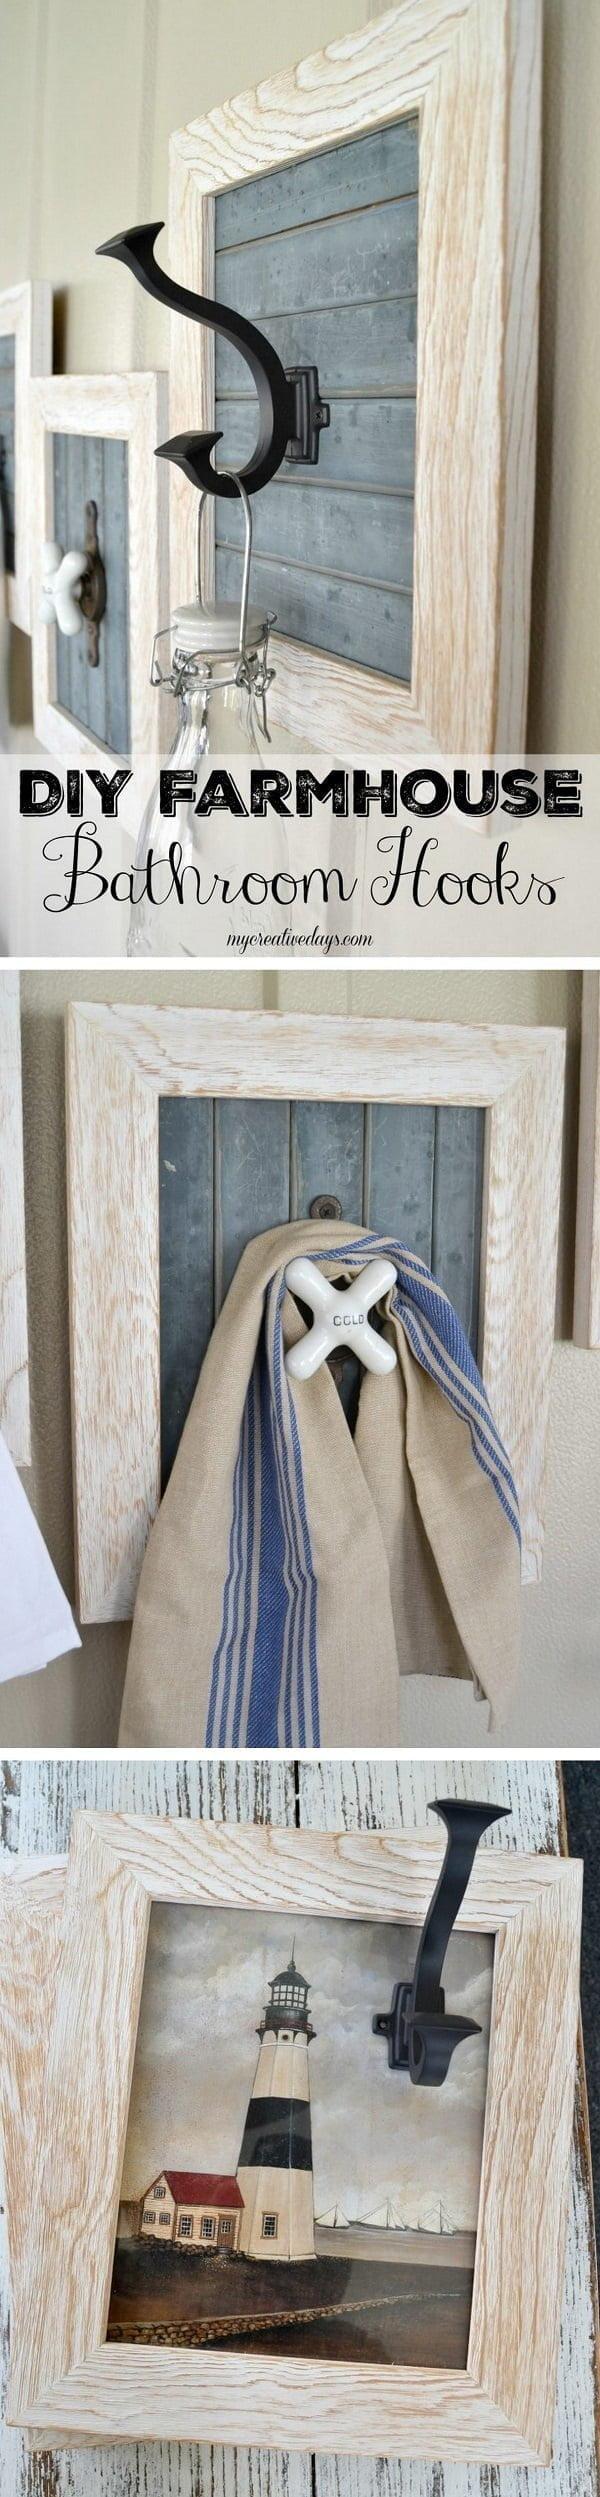 How to make your own DIY farmhouse style bathroom hooks